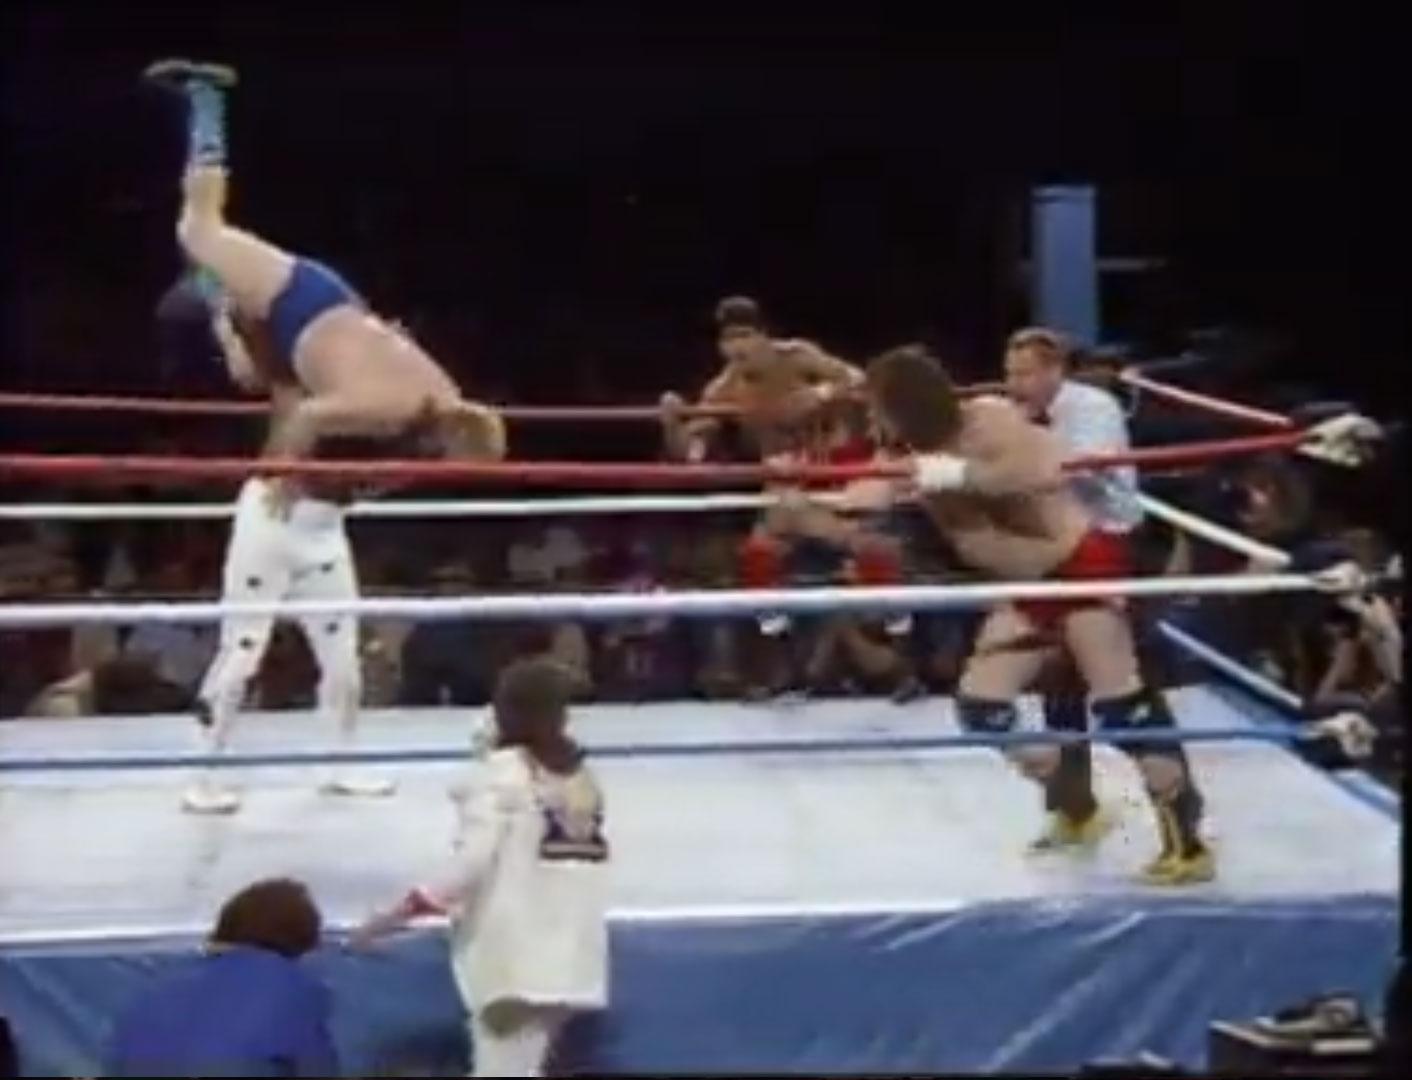 Terry Funk & Hoss Funk vs. Junkyard Dog & Tito Santana WWF WrestleMania 2 Apr 7th 1986